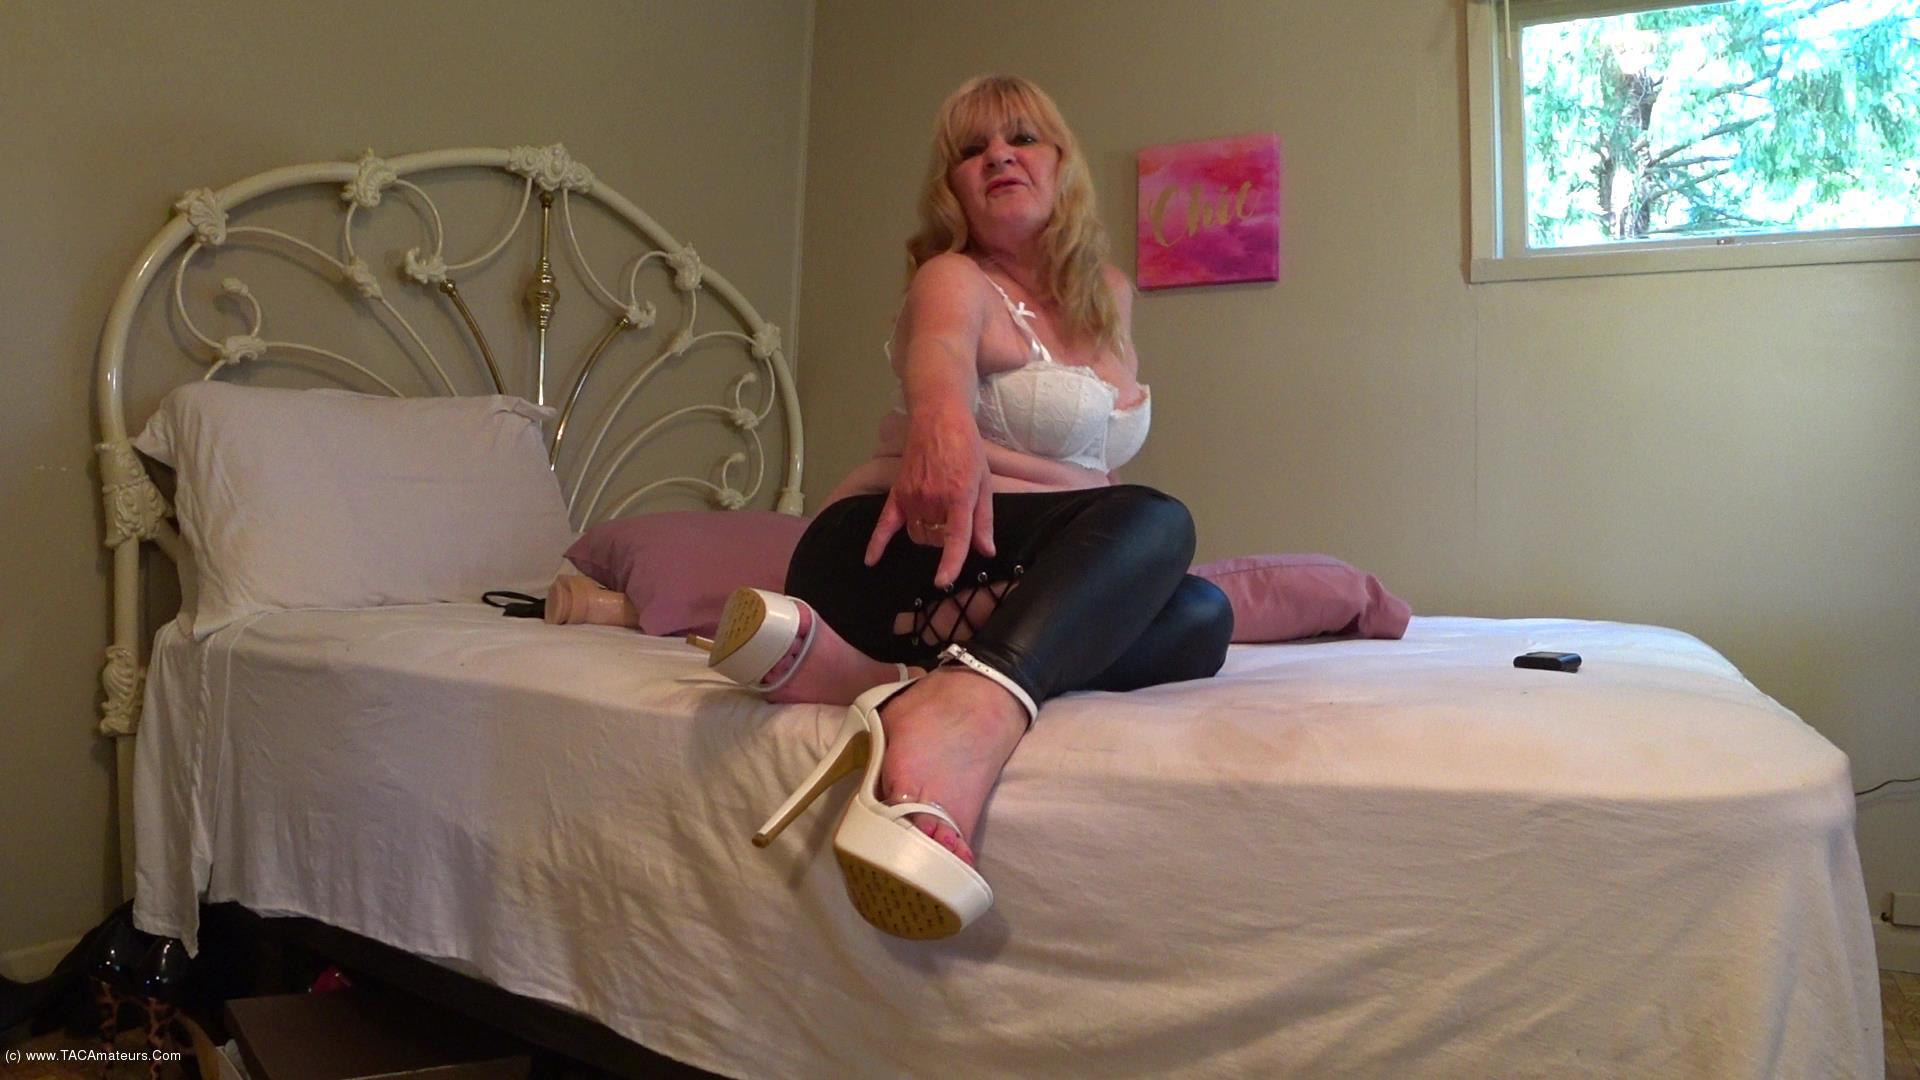 CougarBabeJolee - Worship Goddess In PVC Tight Pants & Killer Heels scene 1